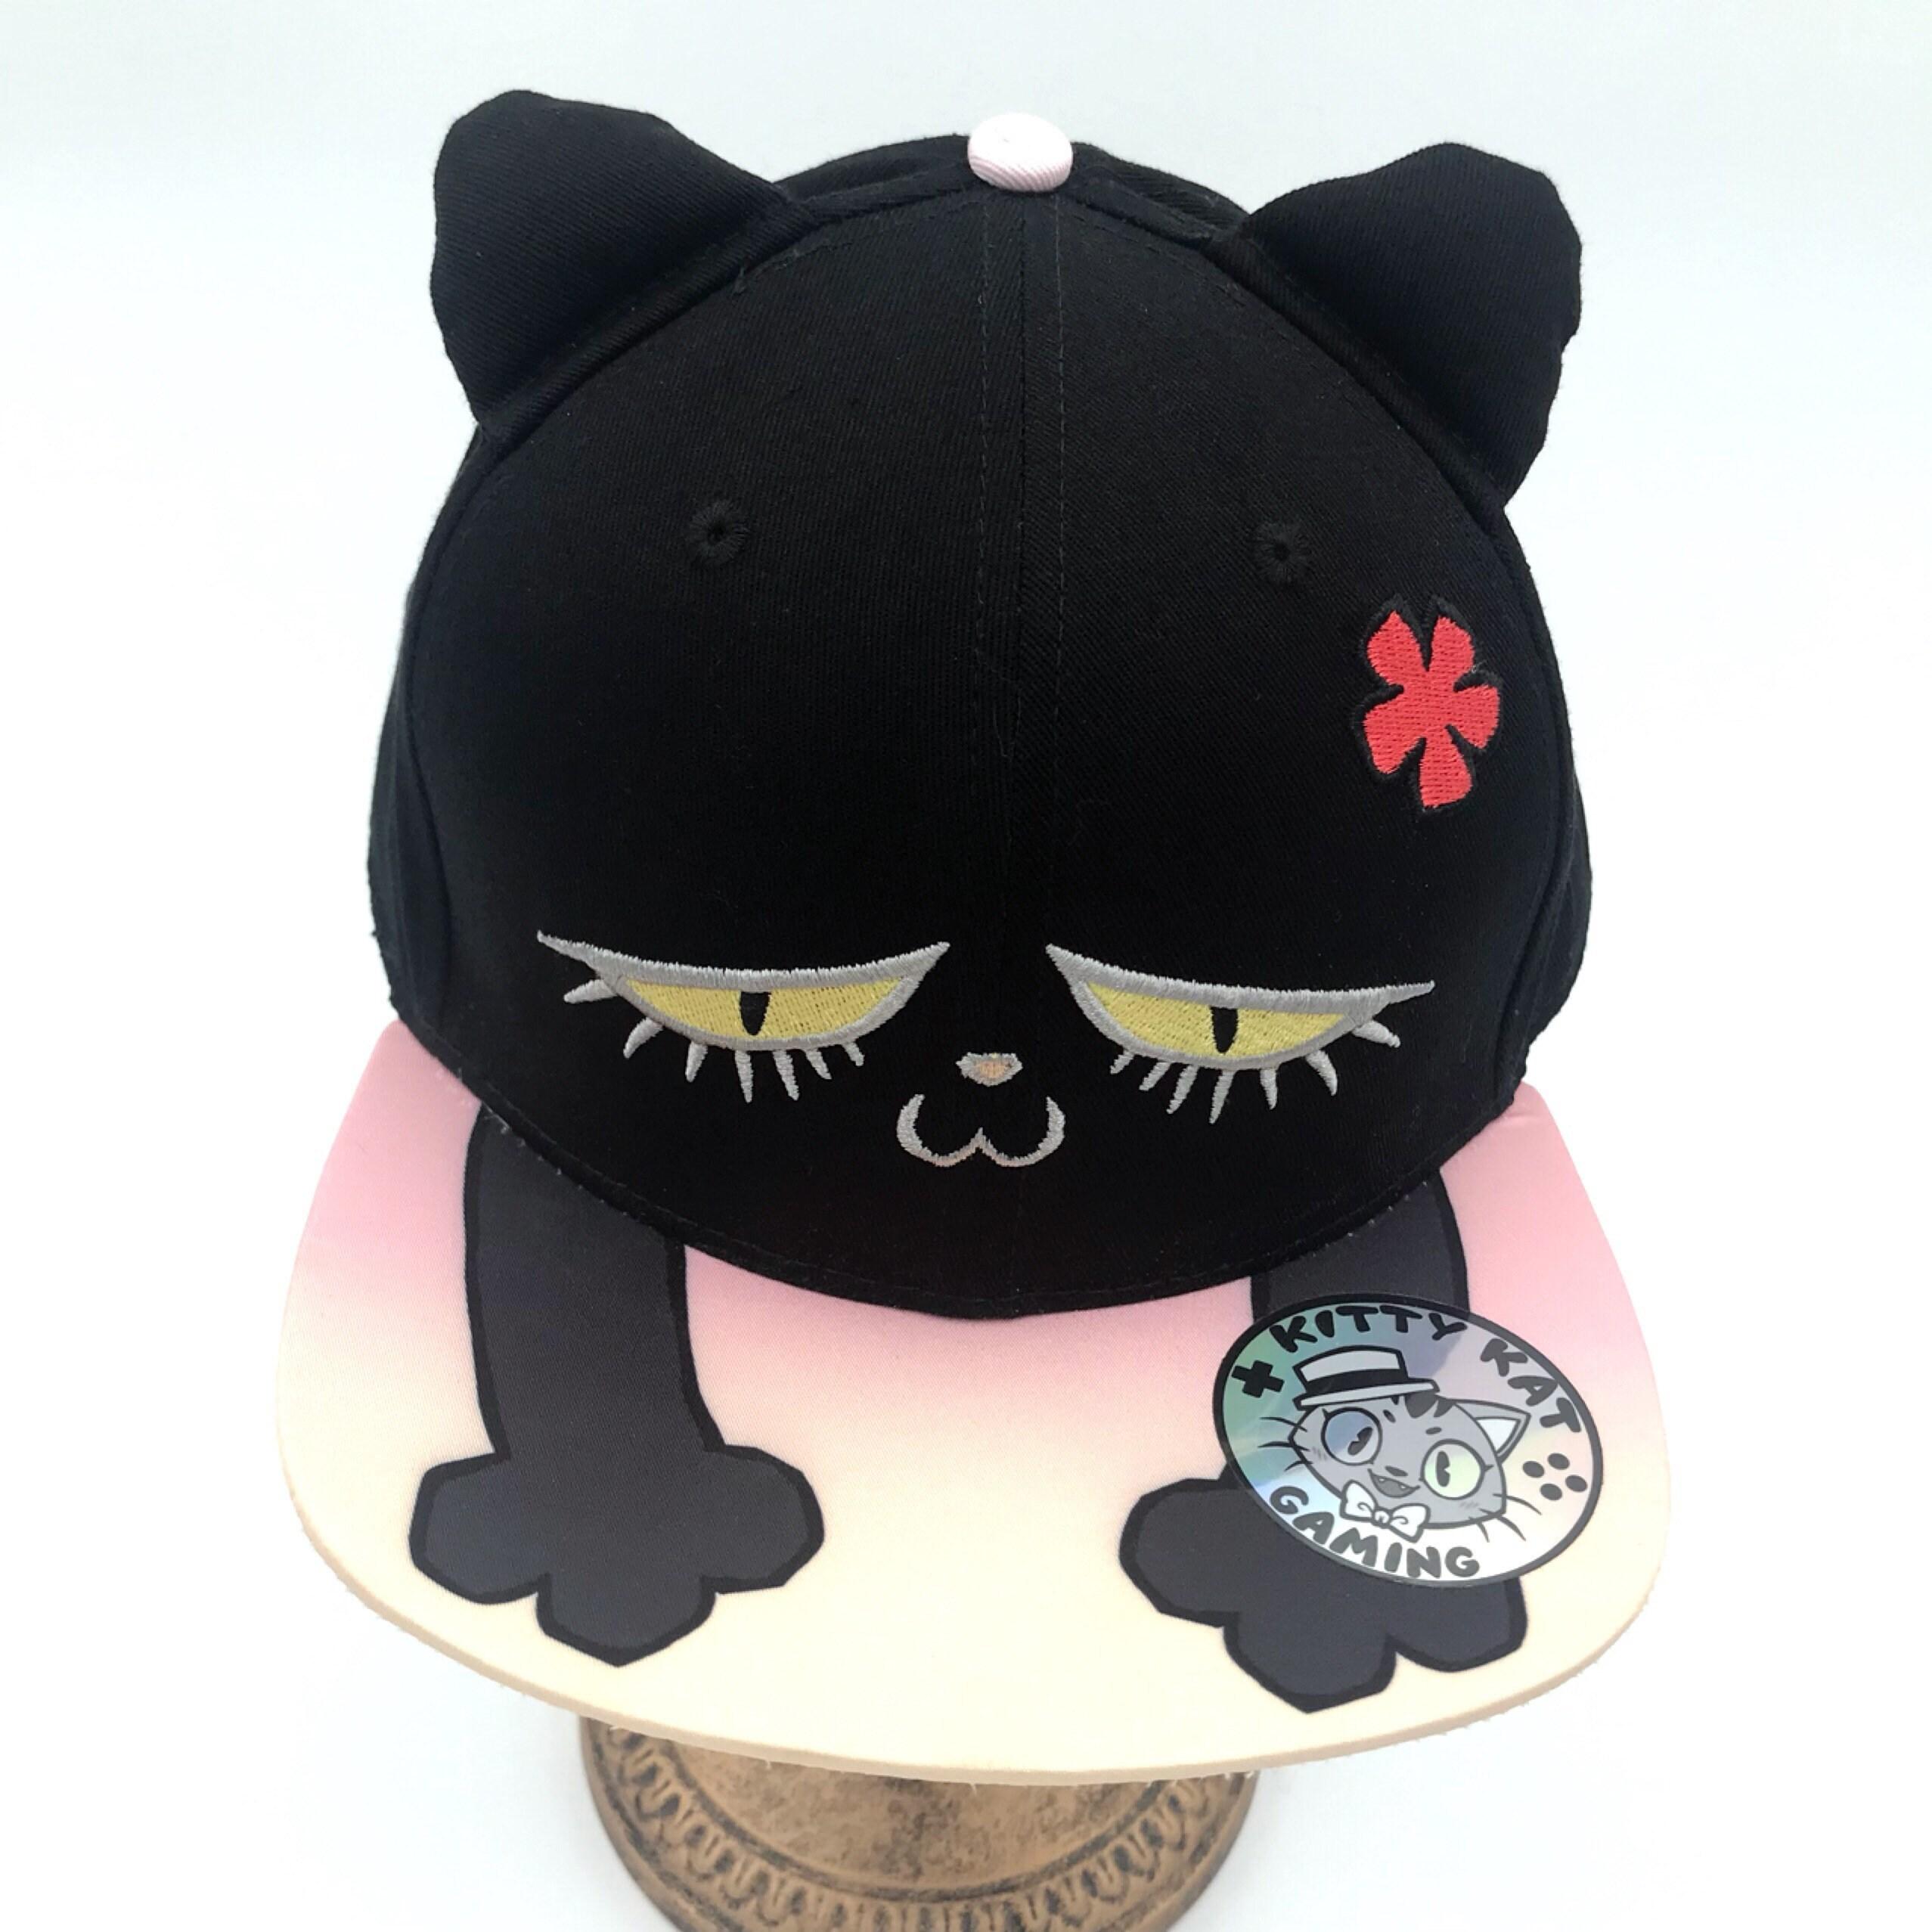 d99a8d9b83225 Kitty kat gaming - cat snapback hat!